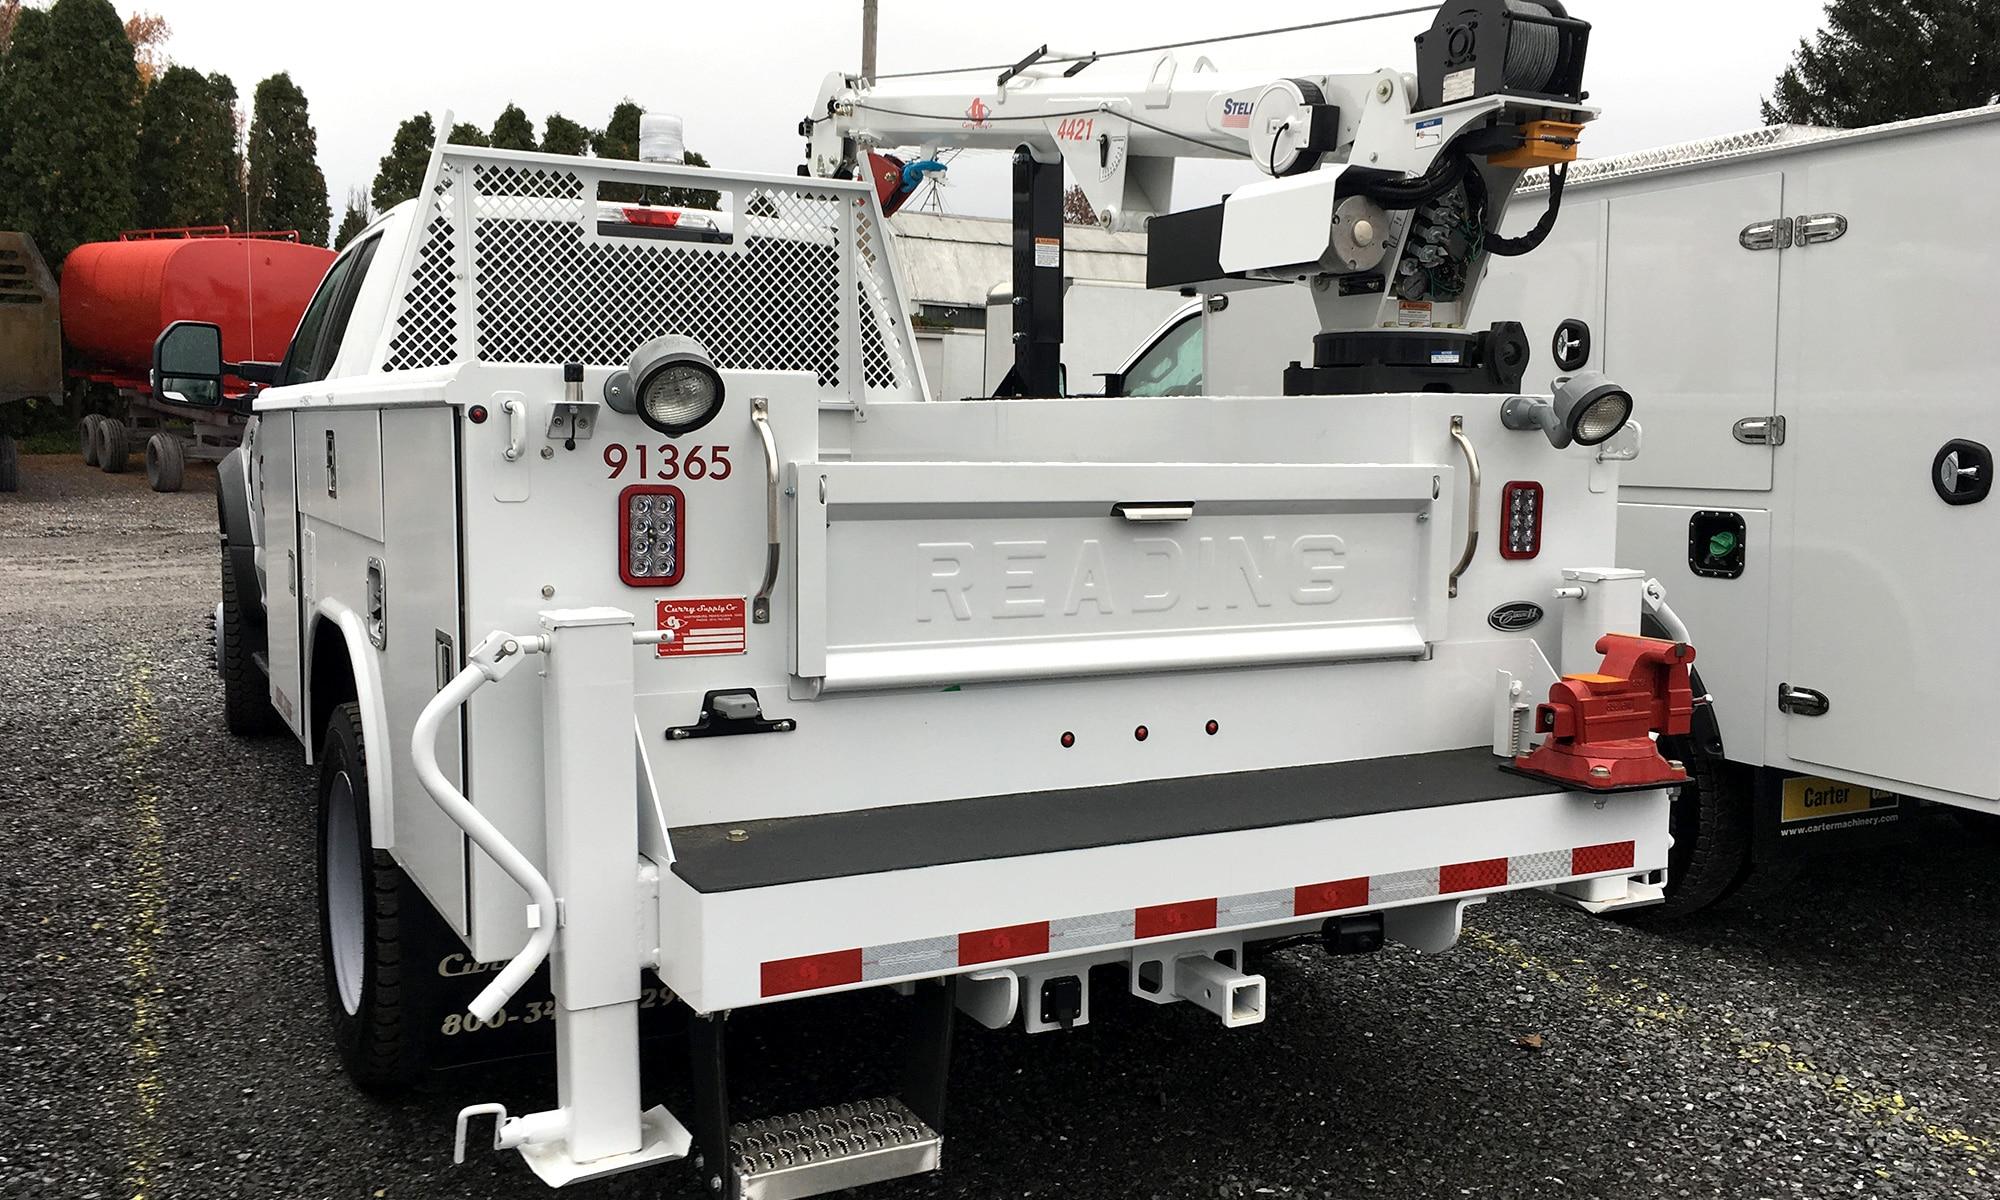 Mechanic's/Service Trucks, Curry Supply Company